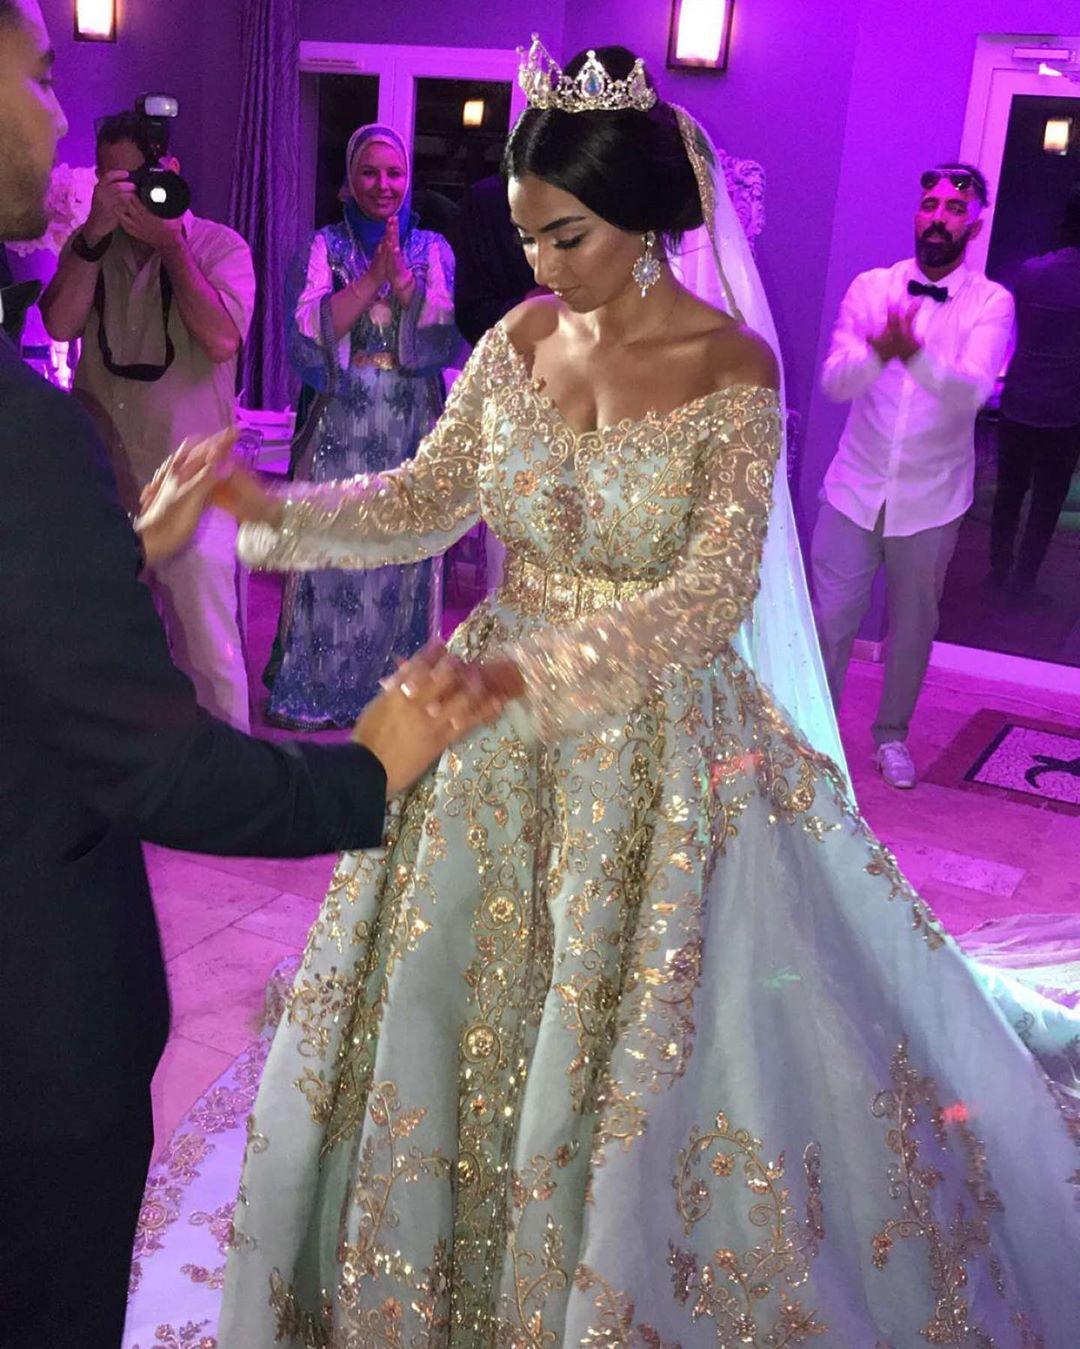 robe de mariage orientale - 55% remise -